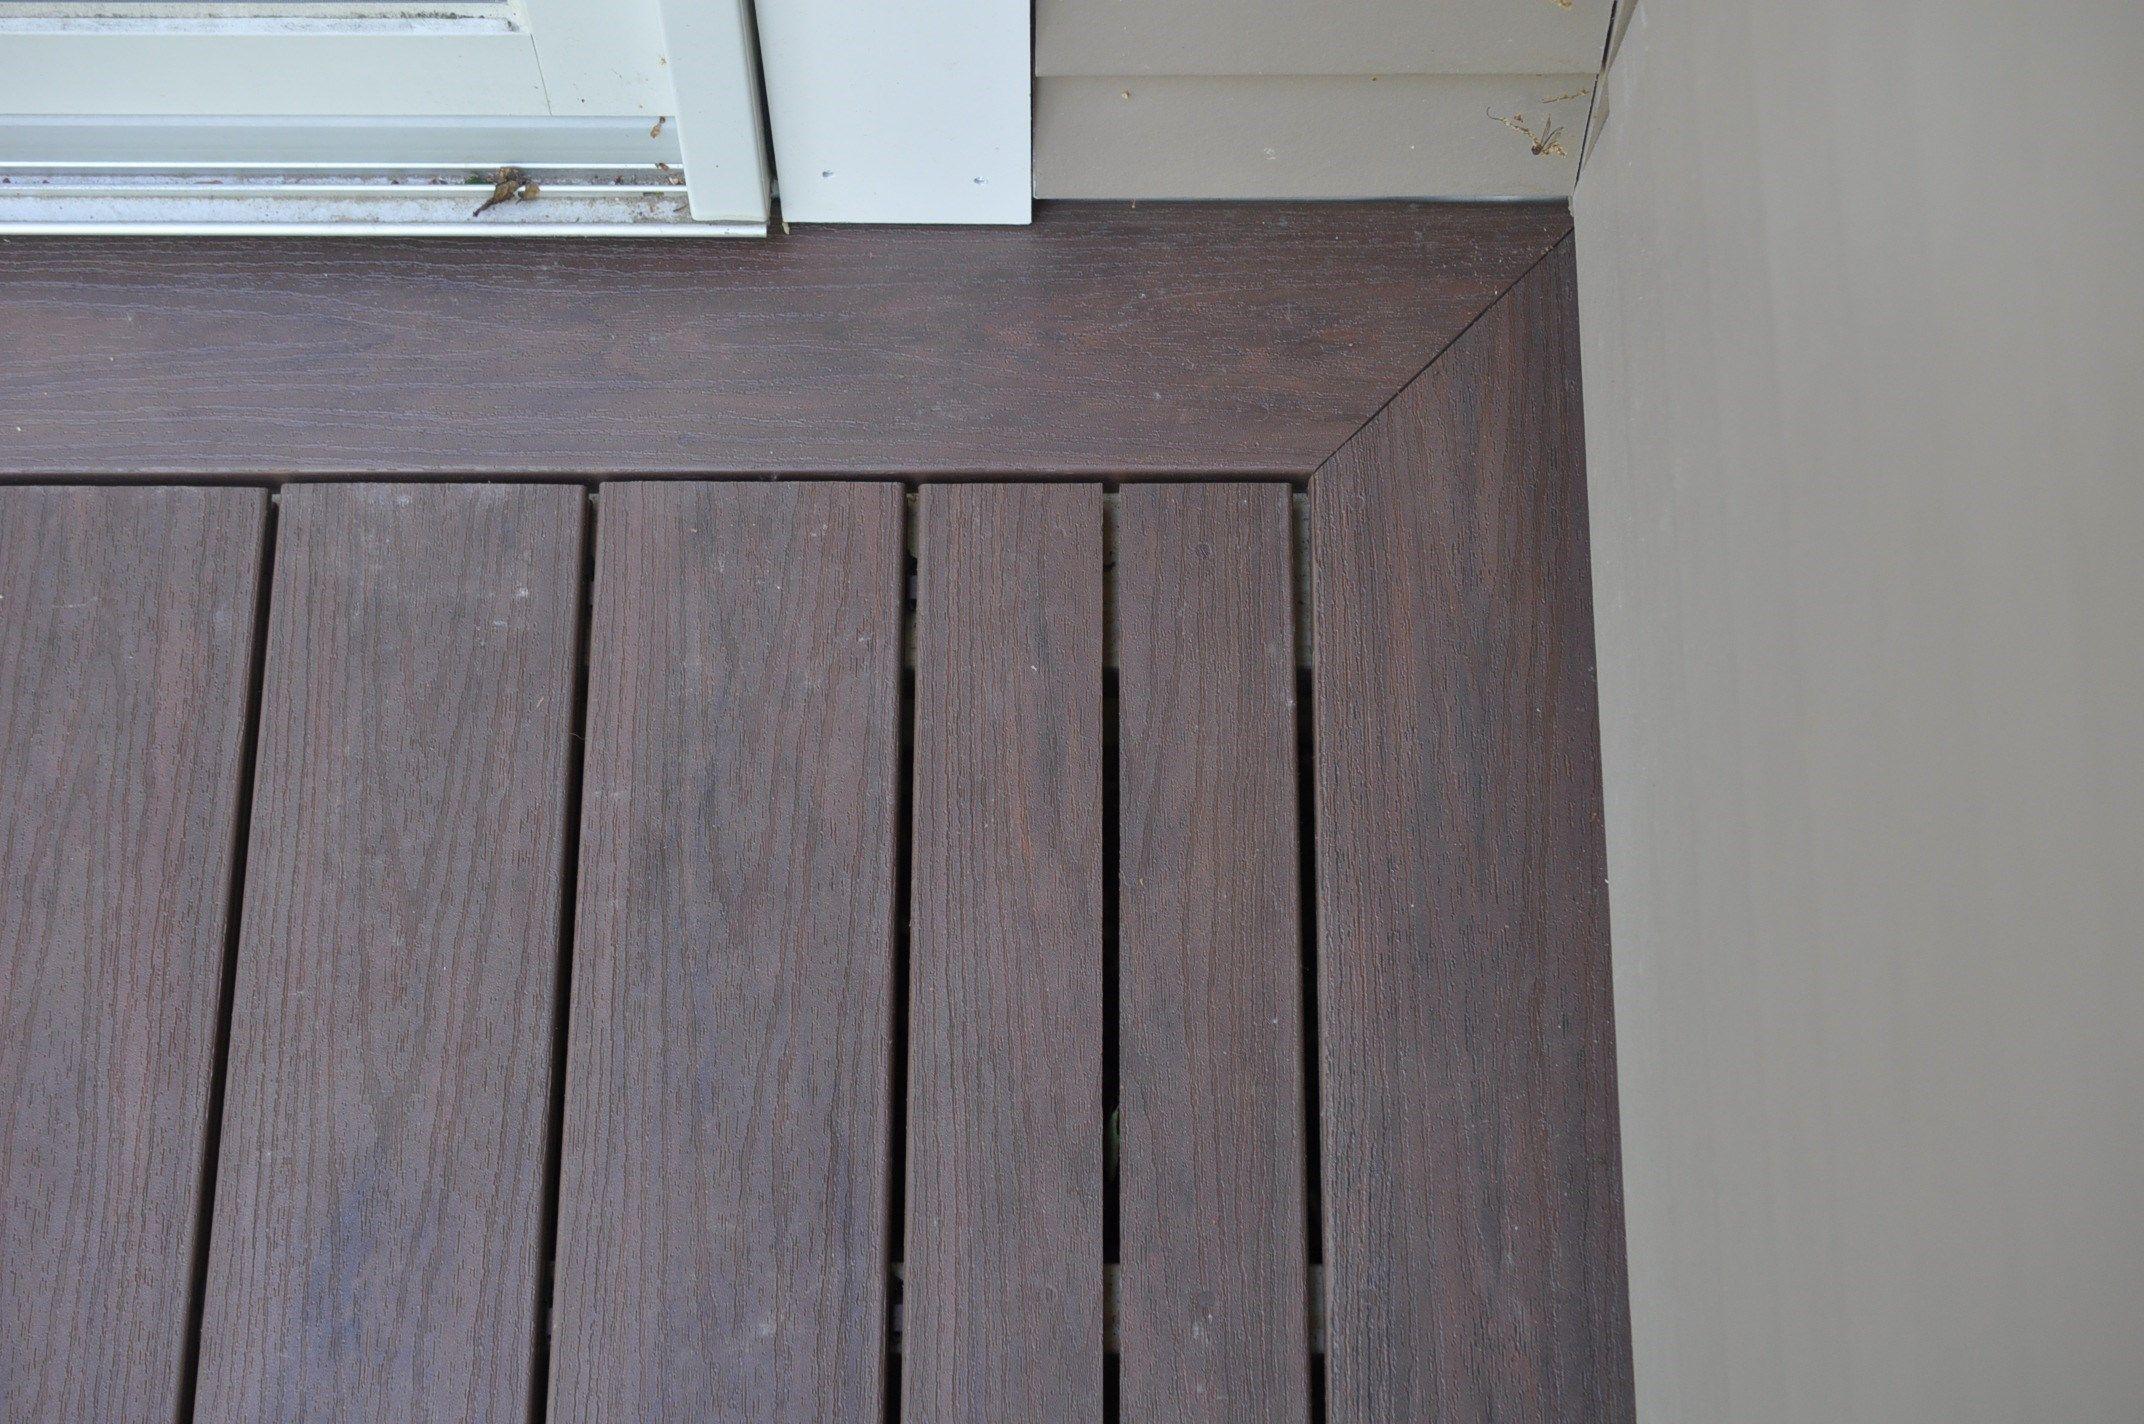 Installing Composite Decking Building A Deck Composite Decking